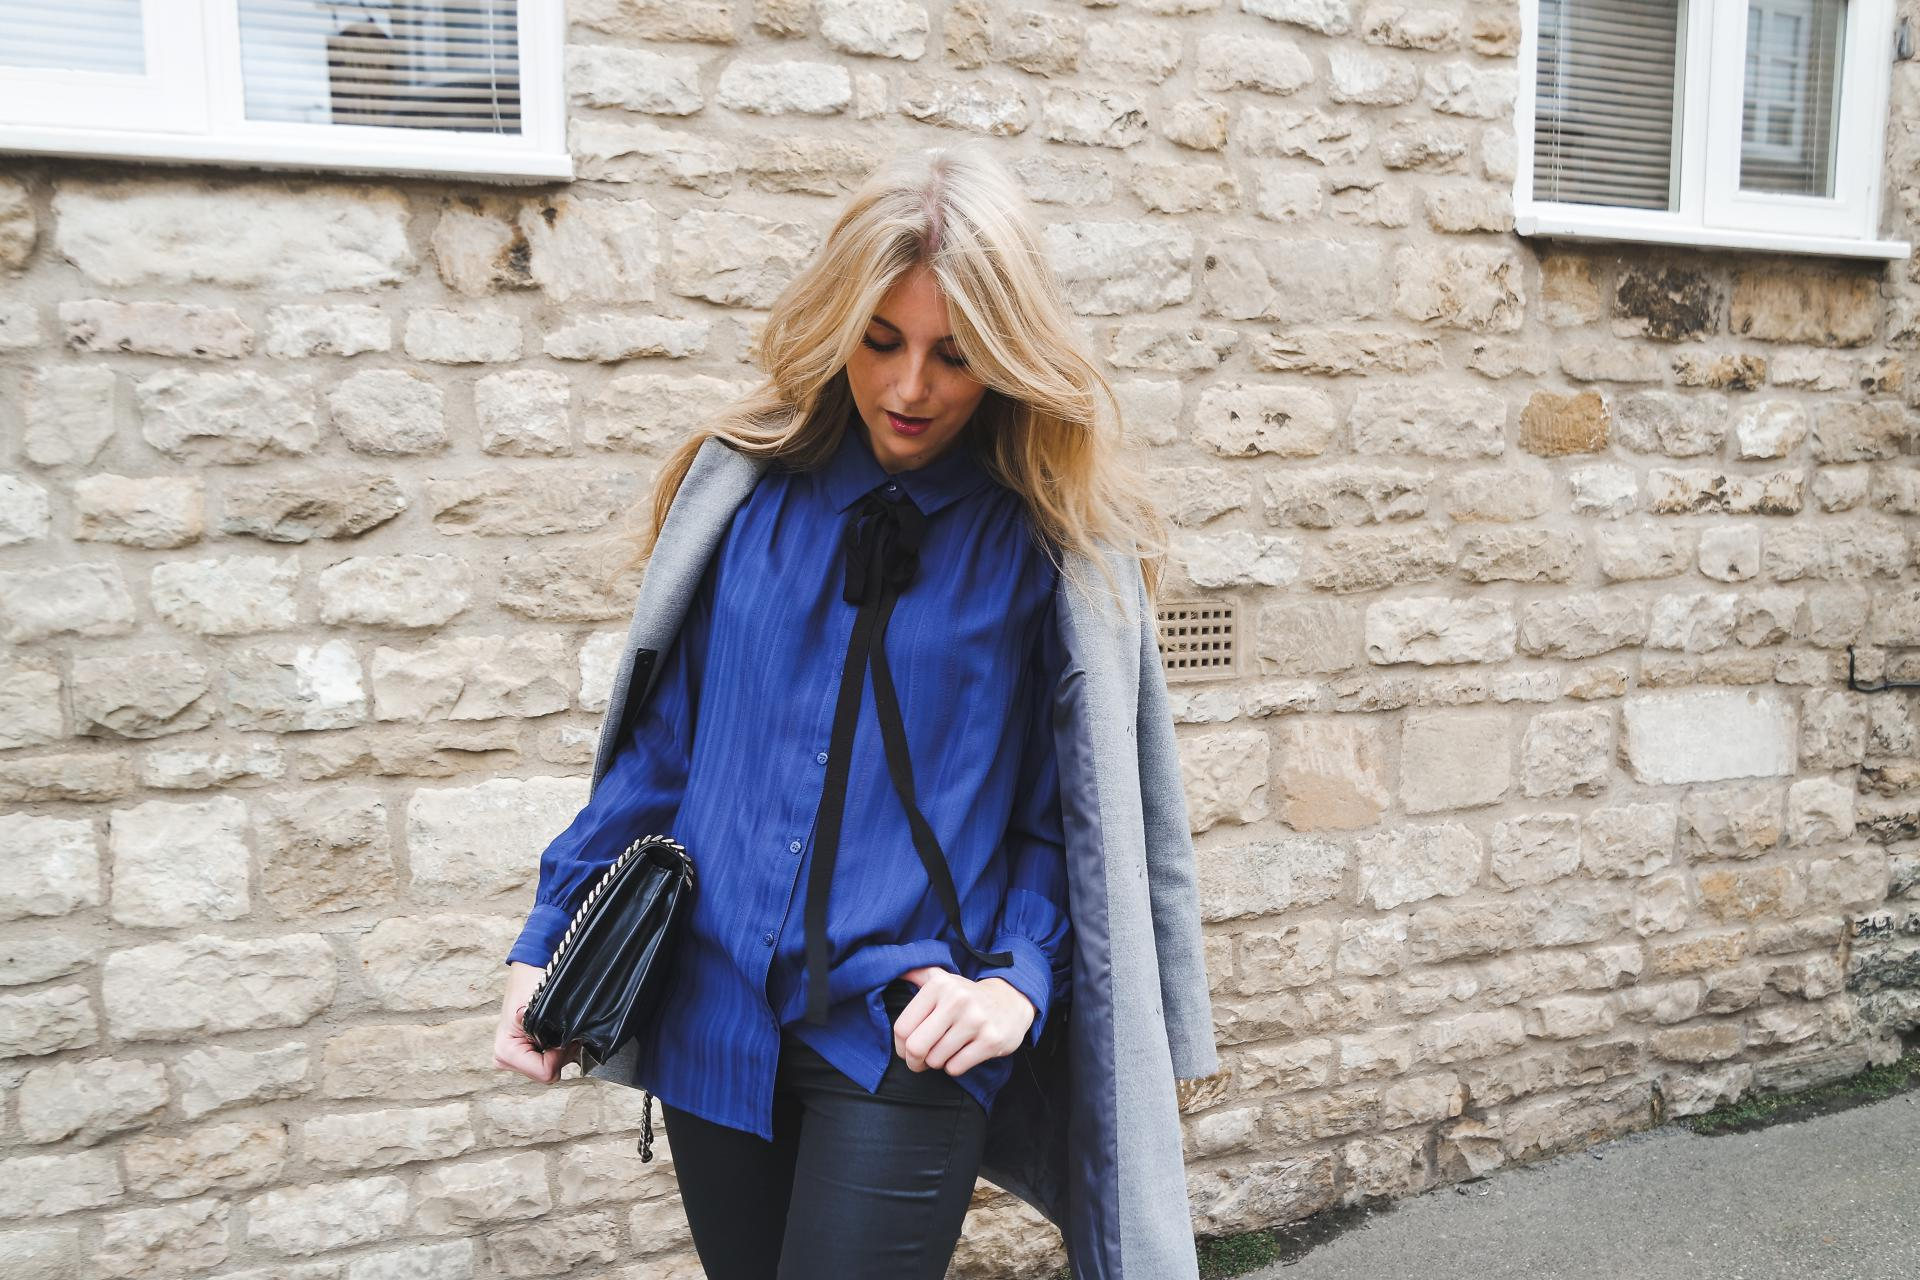 Black Jeans Blue Shirt Nexttake12 Love Style Mindfulness